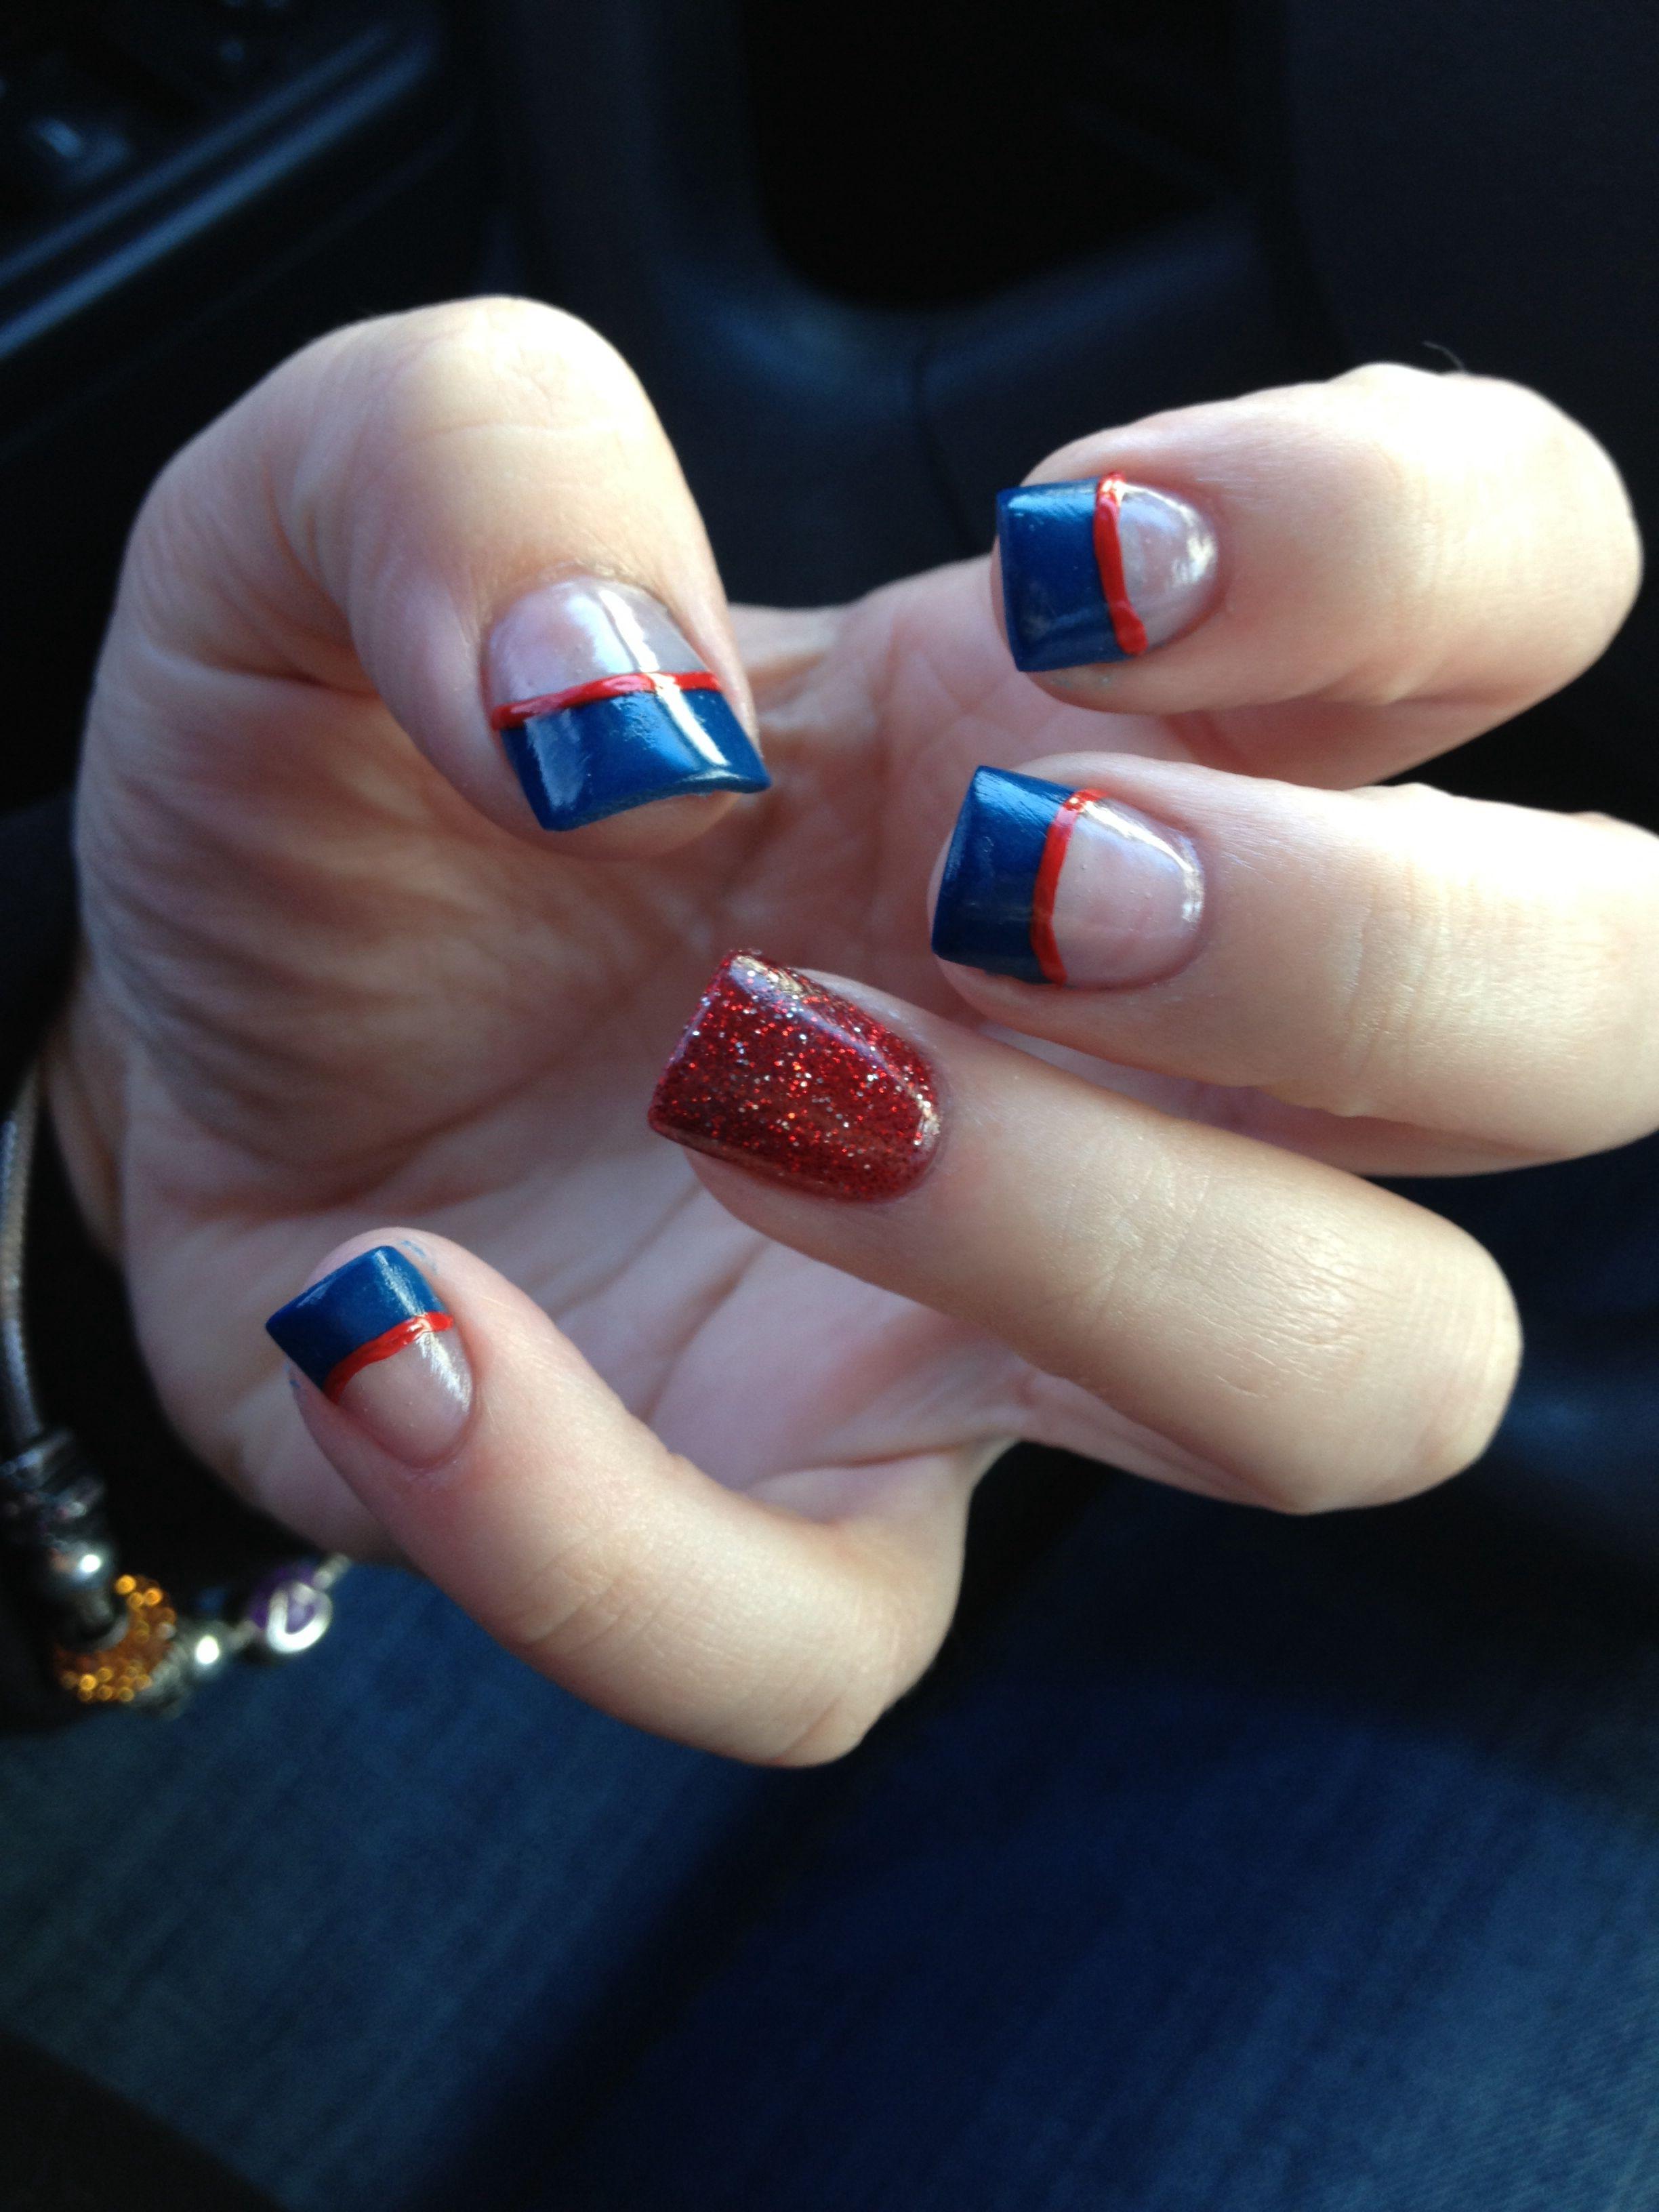 Marine corps, dress blues, nails, nail art, marine girlfriend, MilSO ...